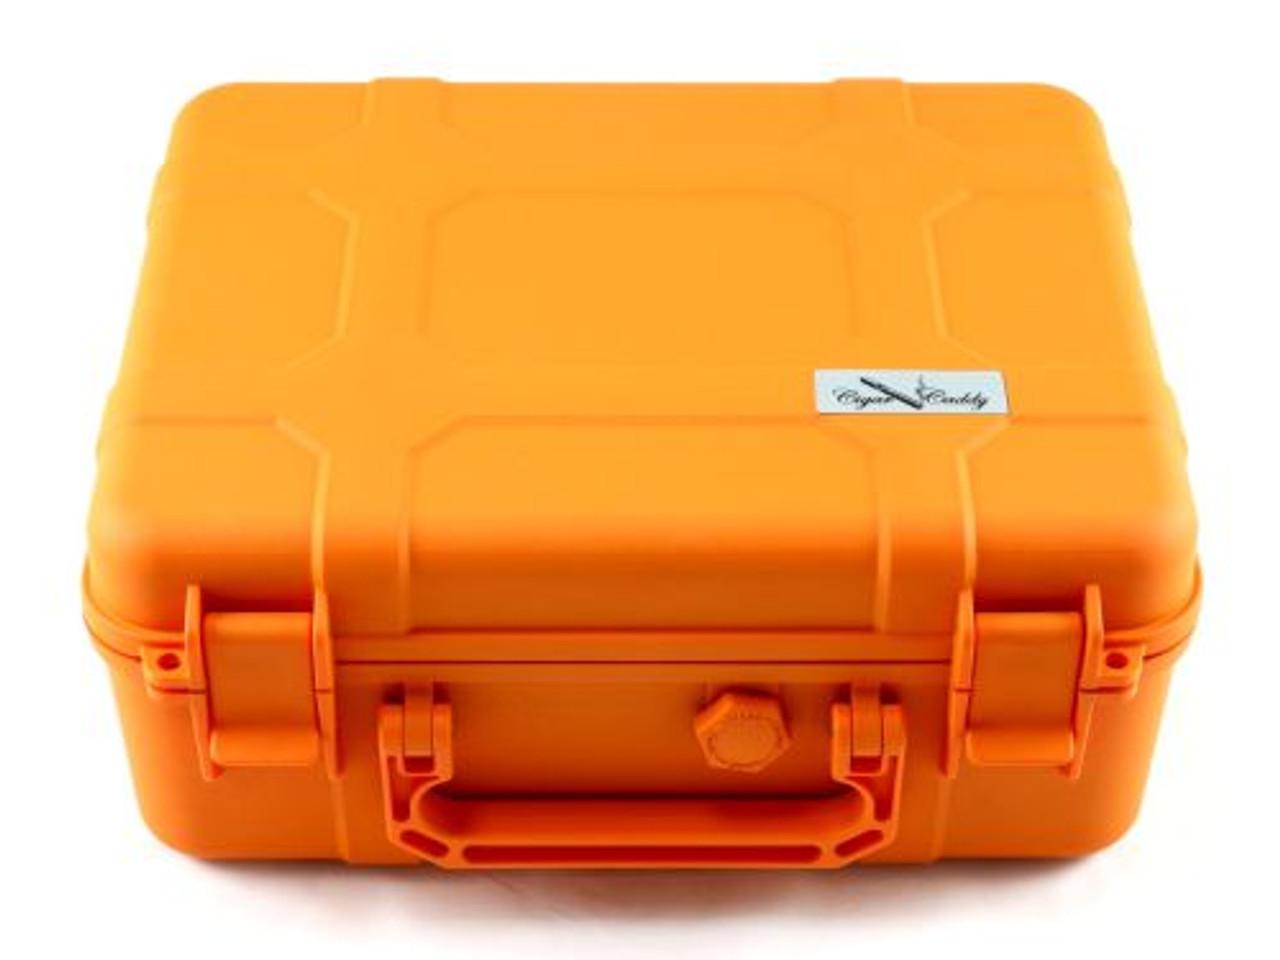 Cigar Caddy Orange 40 Stick Travel Cigar Humidor